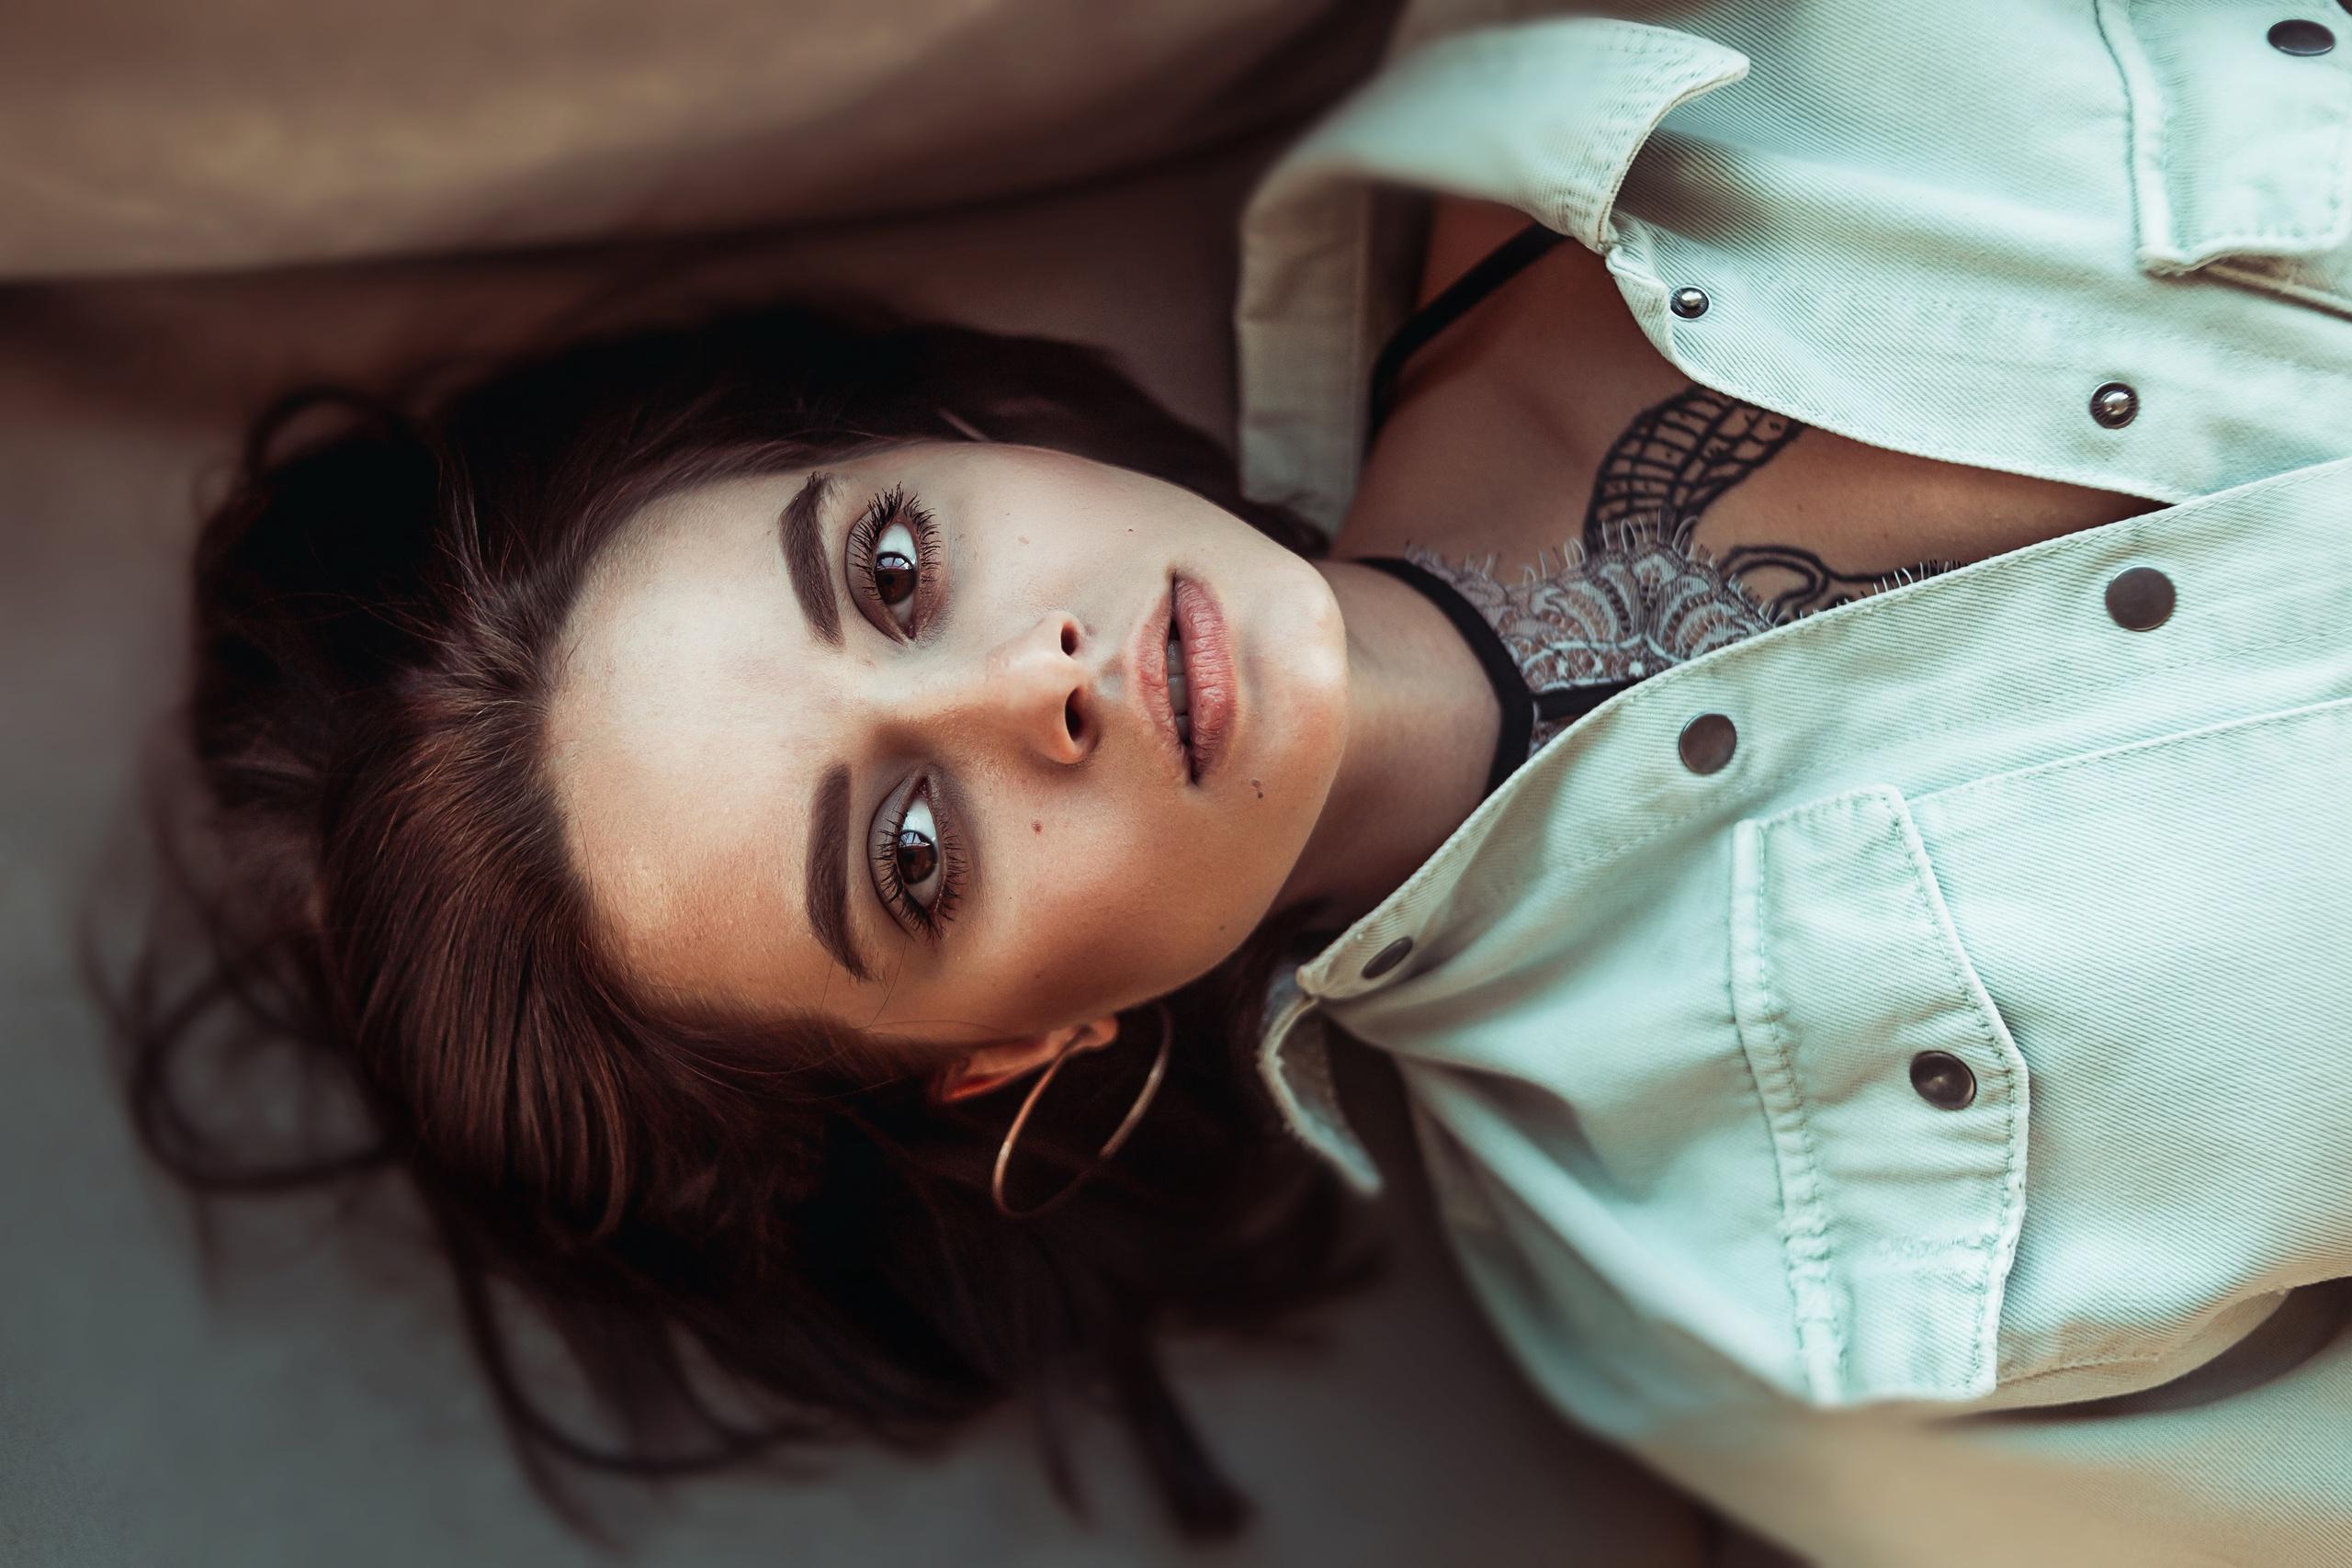 https://www.youngfolks.ru/pub/model-polina-kuleshova-photographer-stepan-grachev